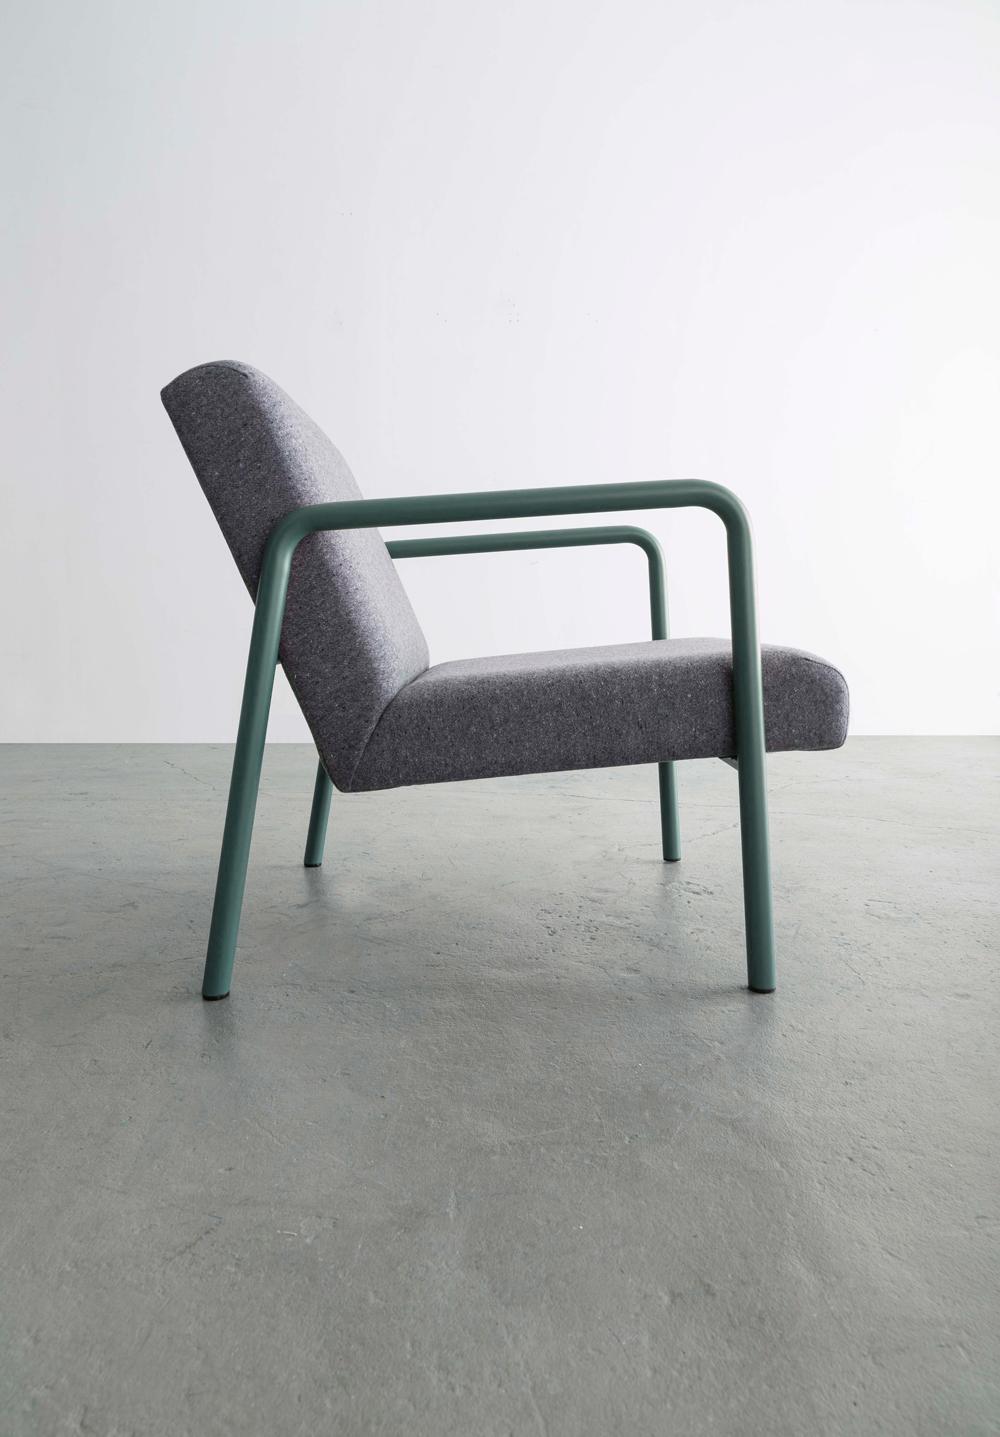 Berm Lounge Chair by David Gaynor Design